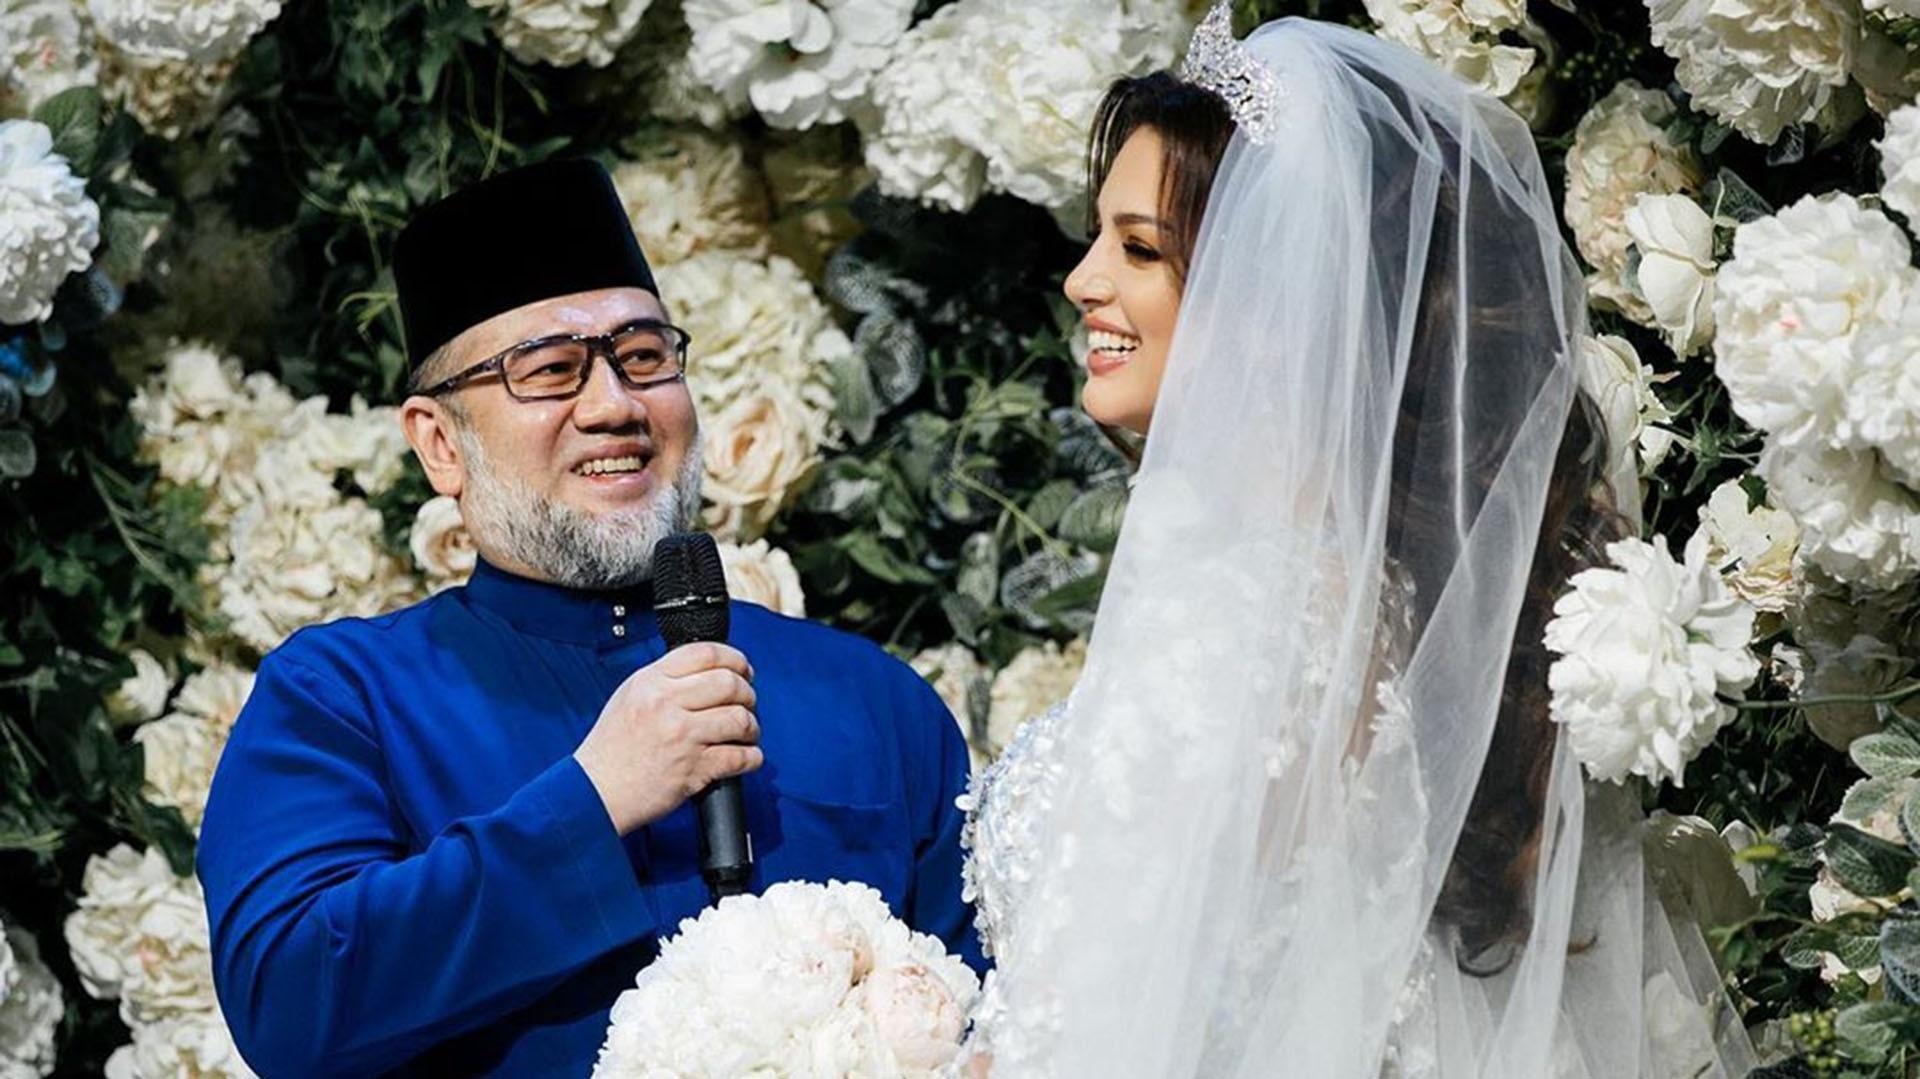 La breve historia de amor del rey de Malasia y Miss Moscú ...